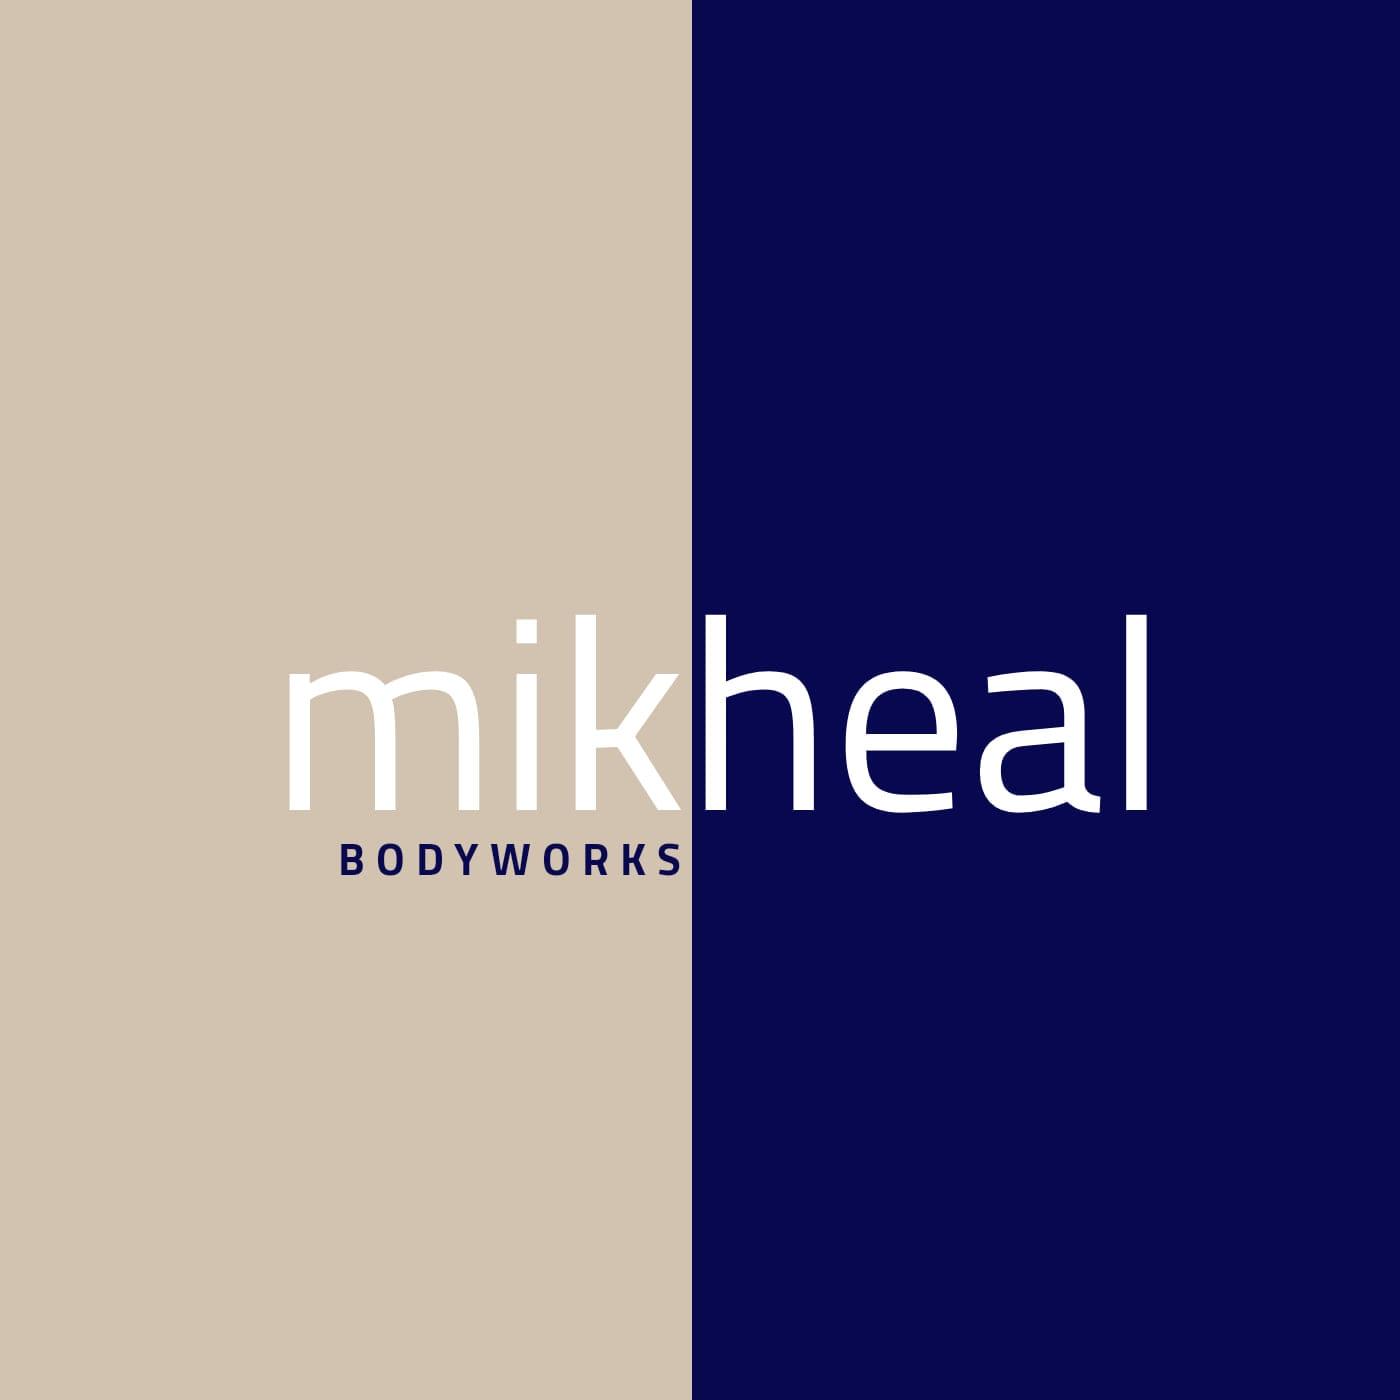 Mikheal Bodyworks